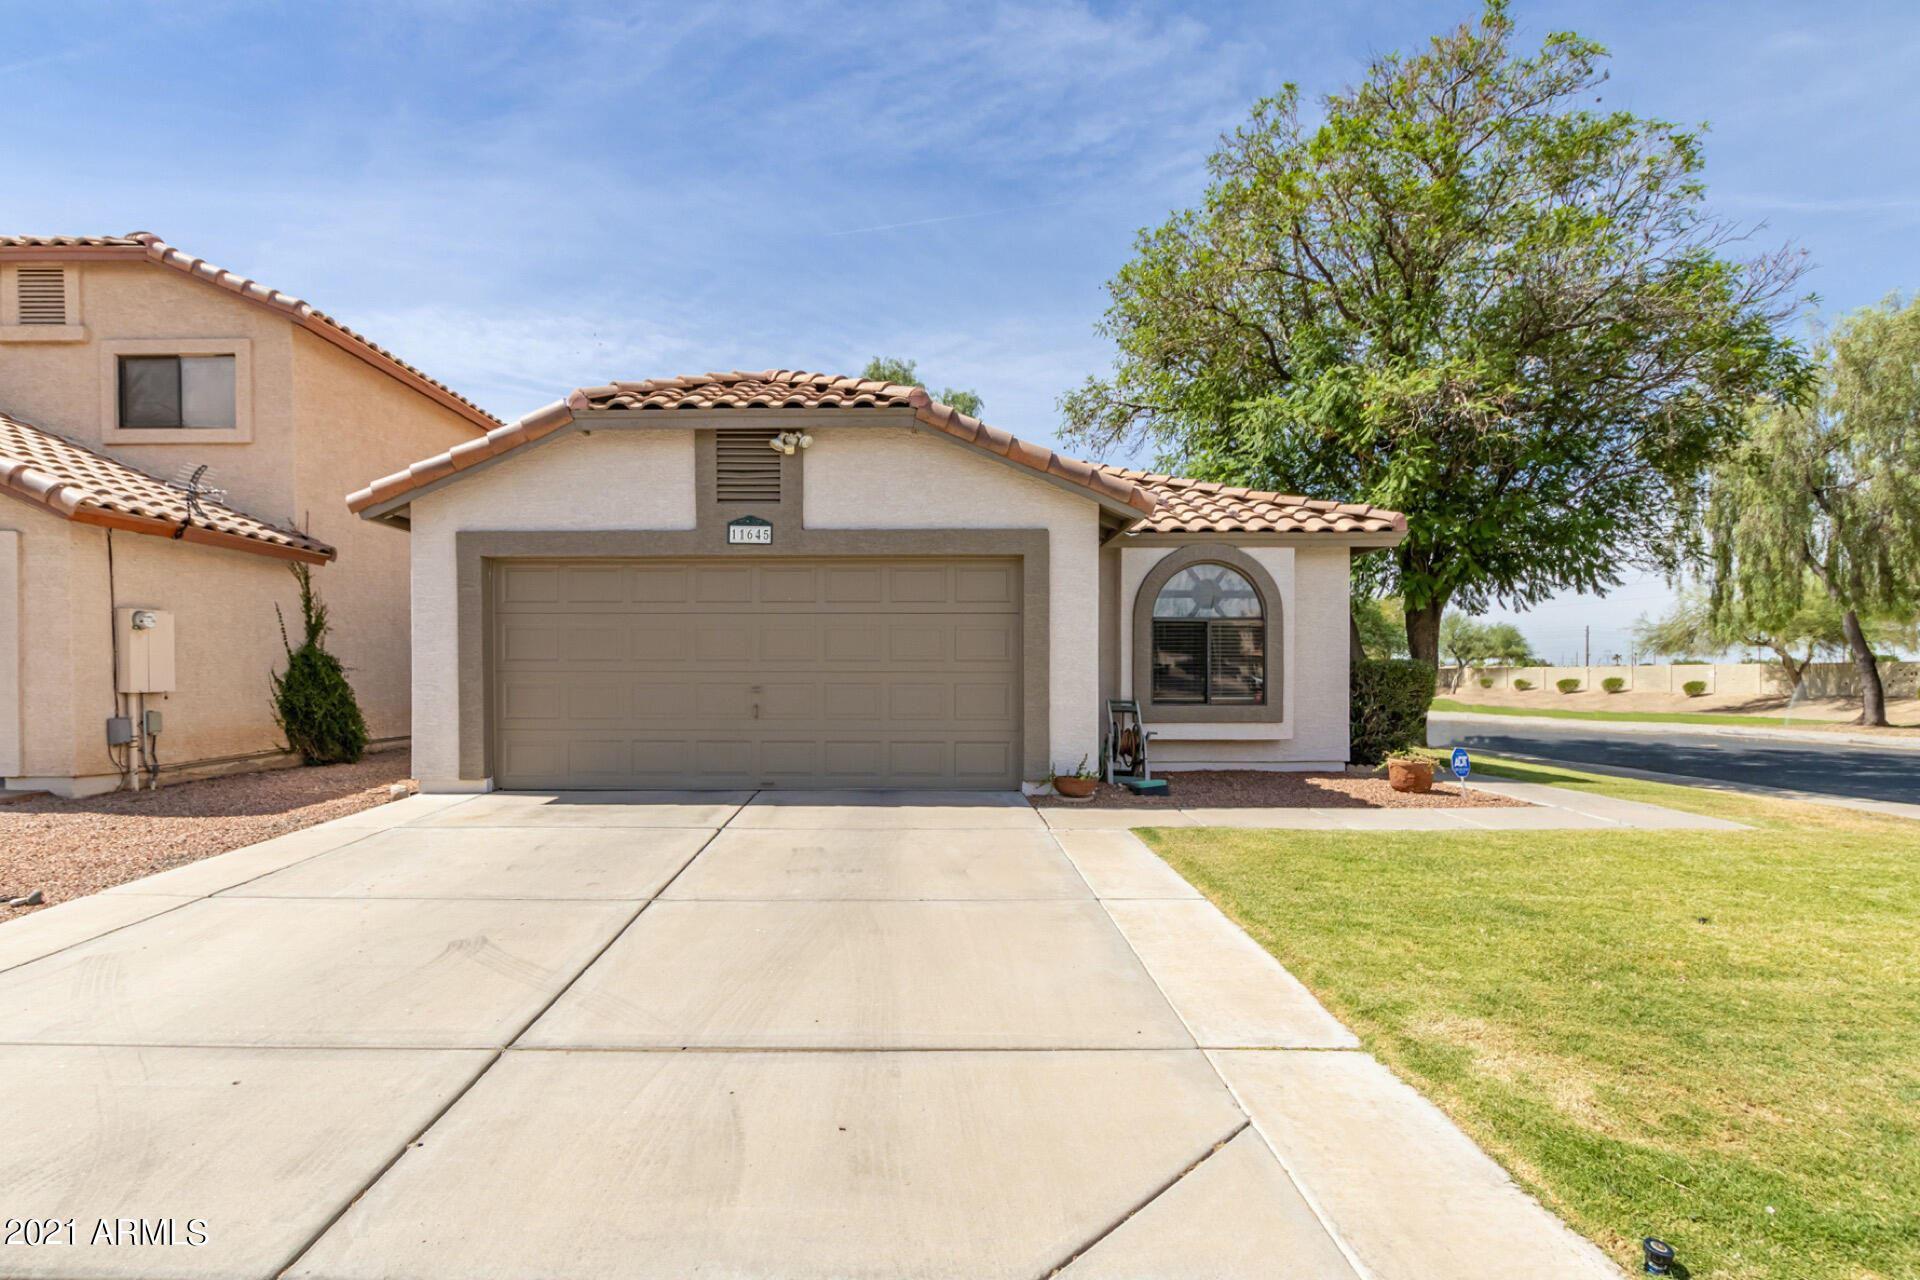 Photo of 11645 W OLIVE Drive, Avondale, AZ 85392 (MLS # 6247432)